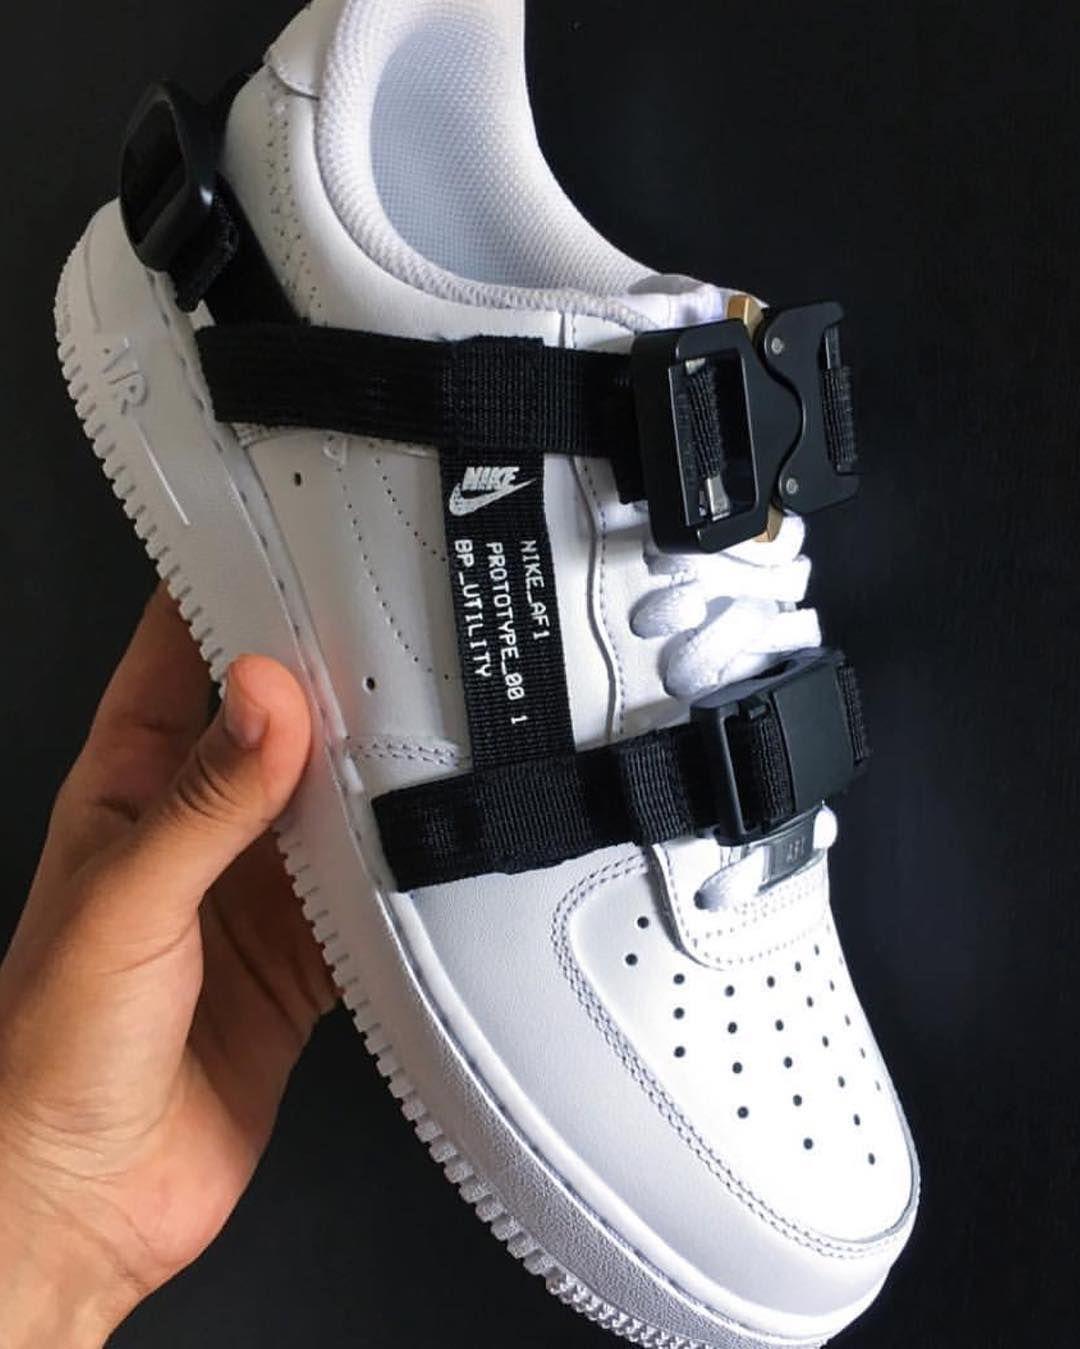 Skechers Ground Force sneakers in 2019 | Products Schoenen